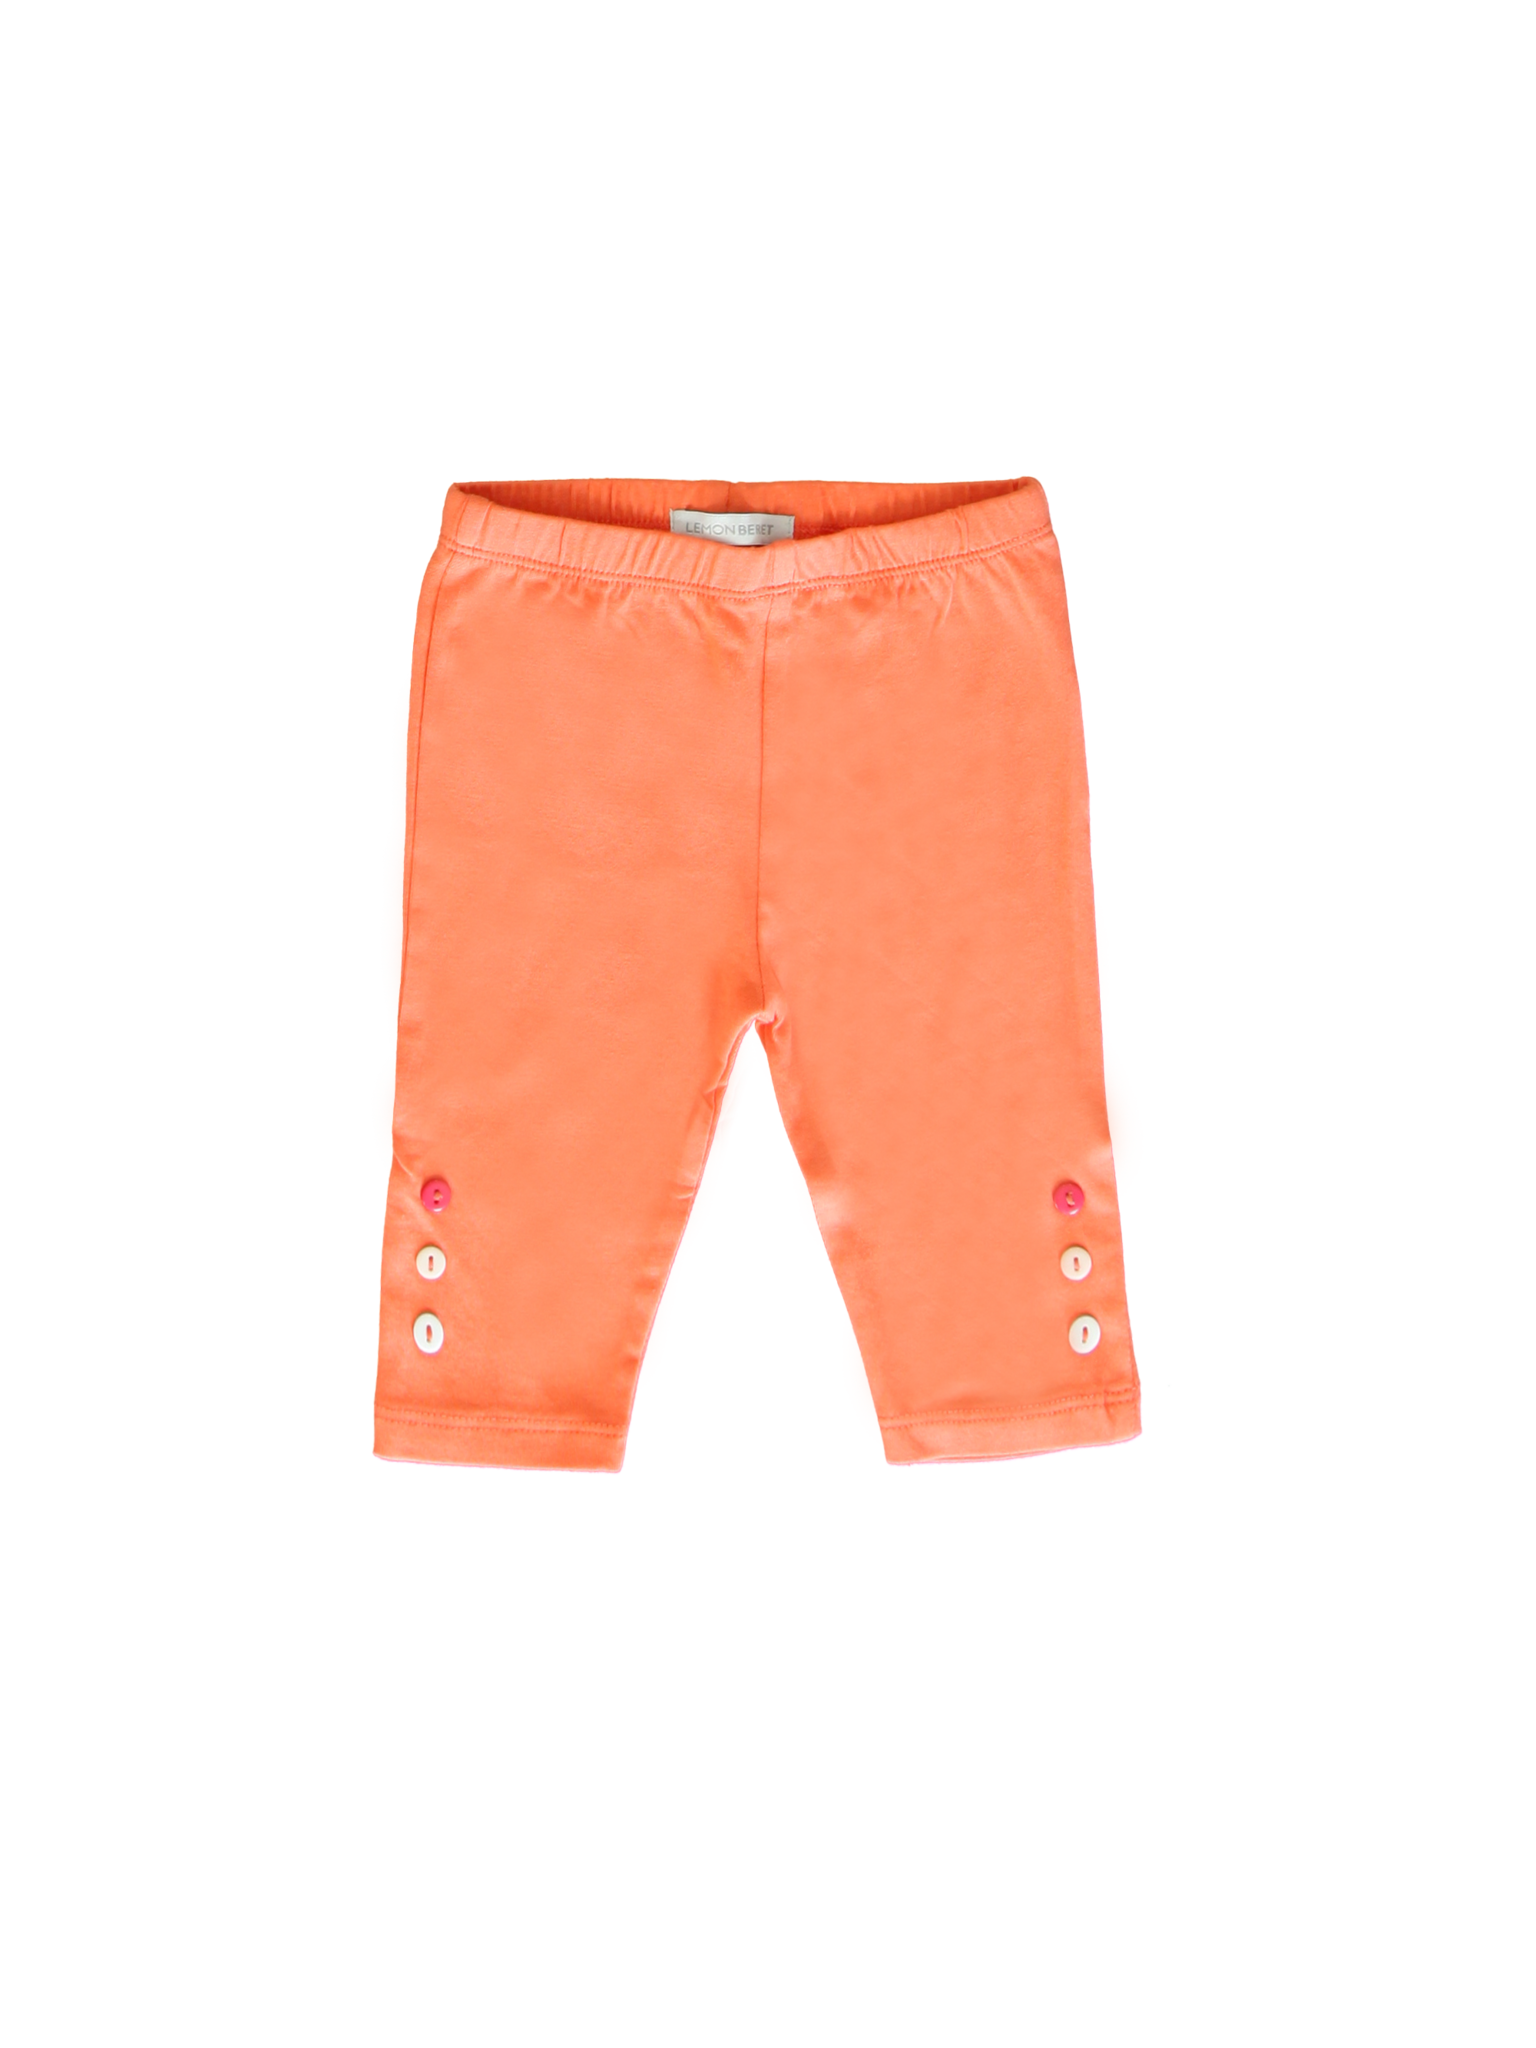 All Brands | Summerproducts Baby | Legging | 24 pcs/box